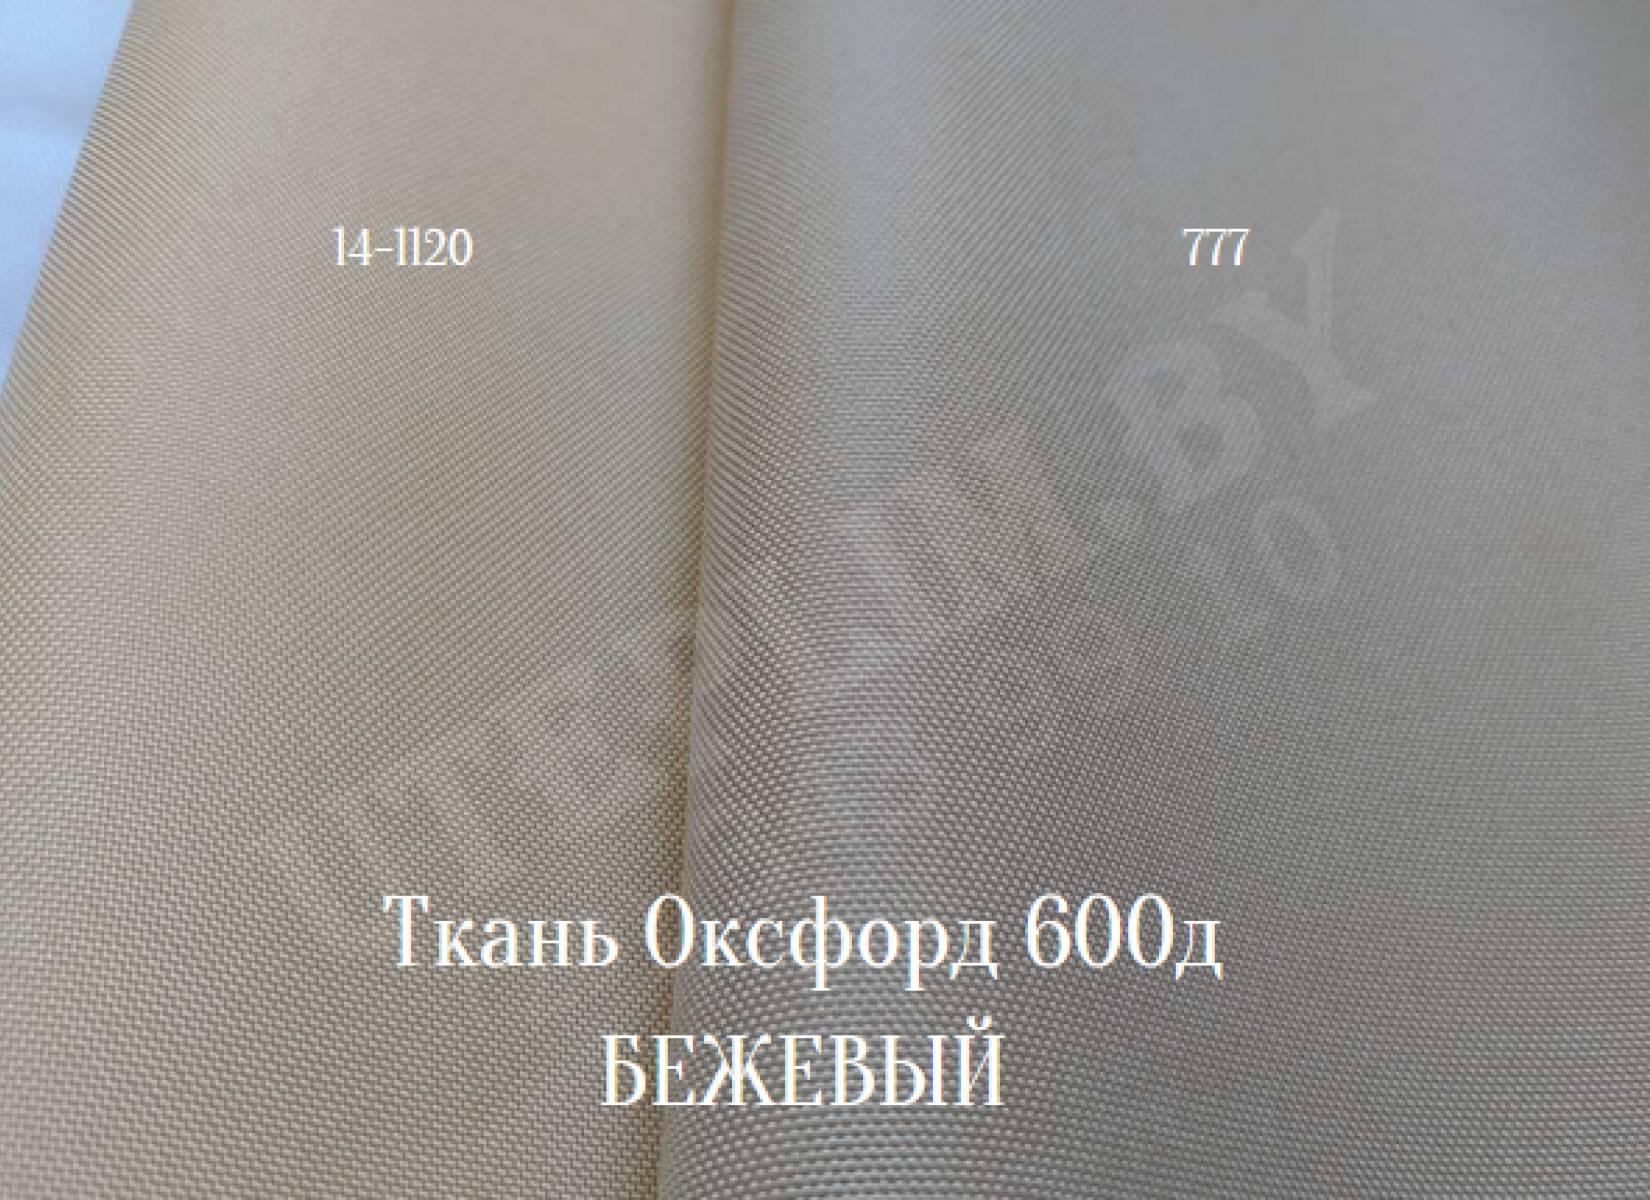 600д - оттенки бежевого